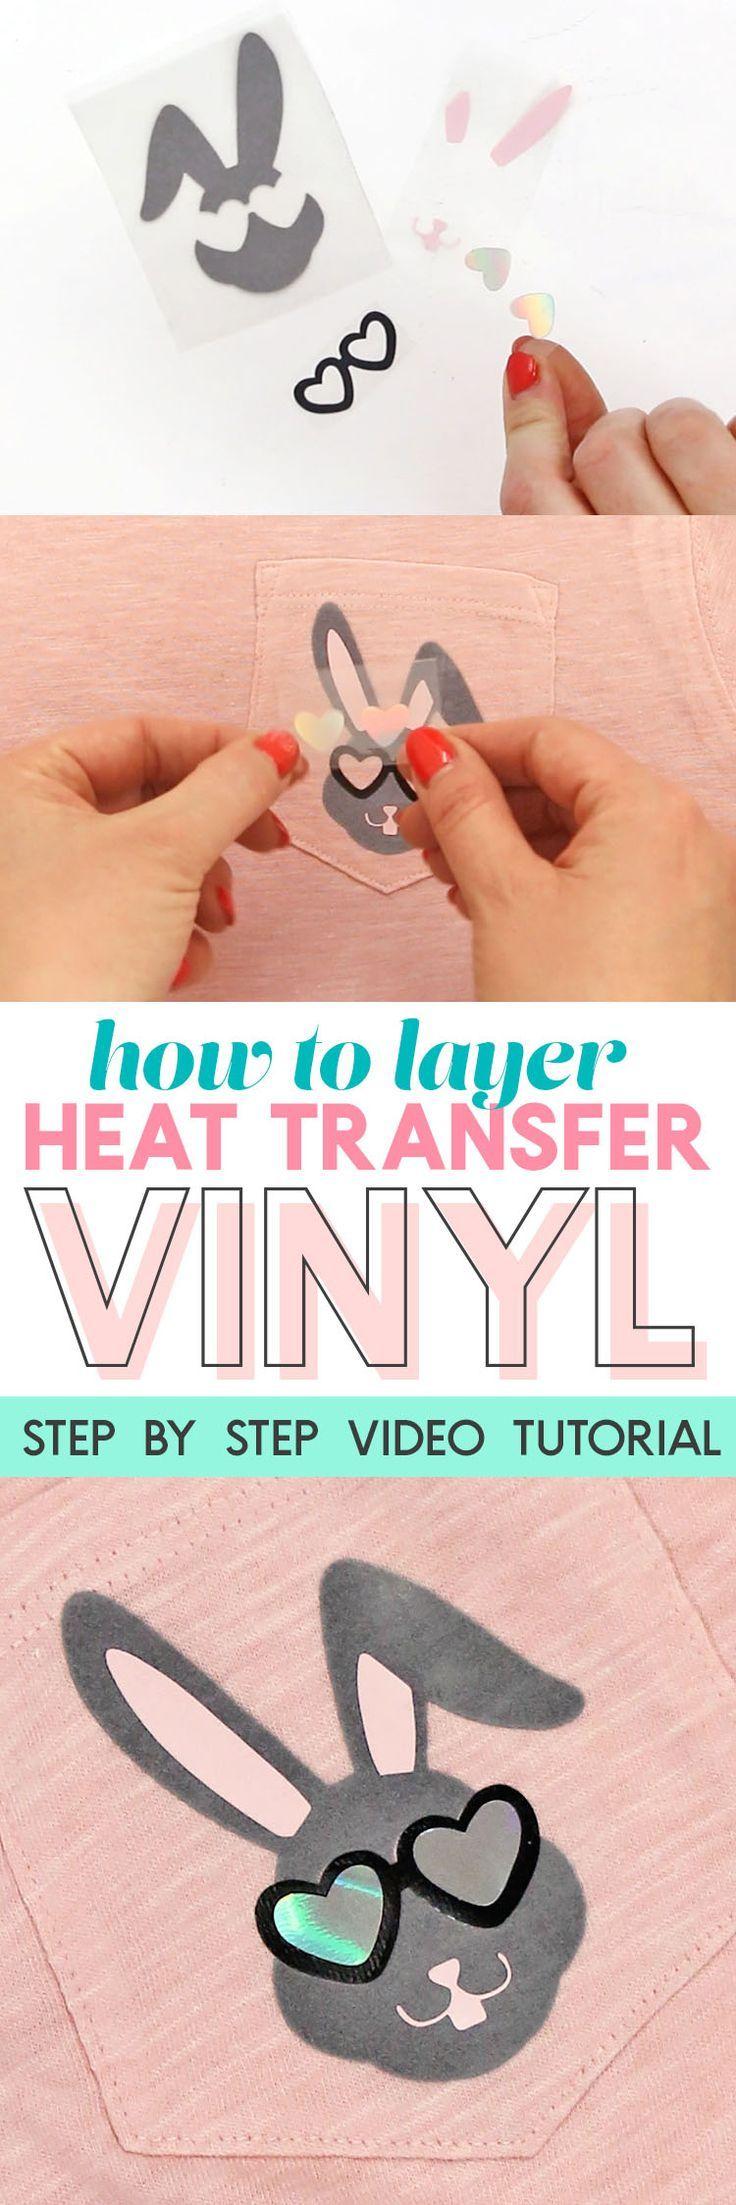 How to Layer Heat Transfer Vinyl